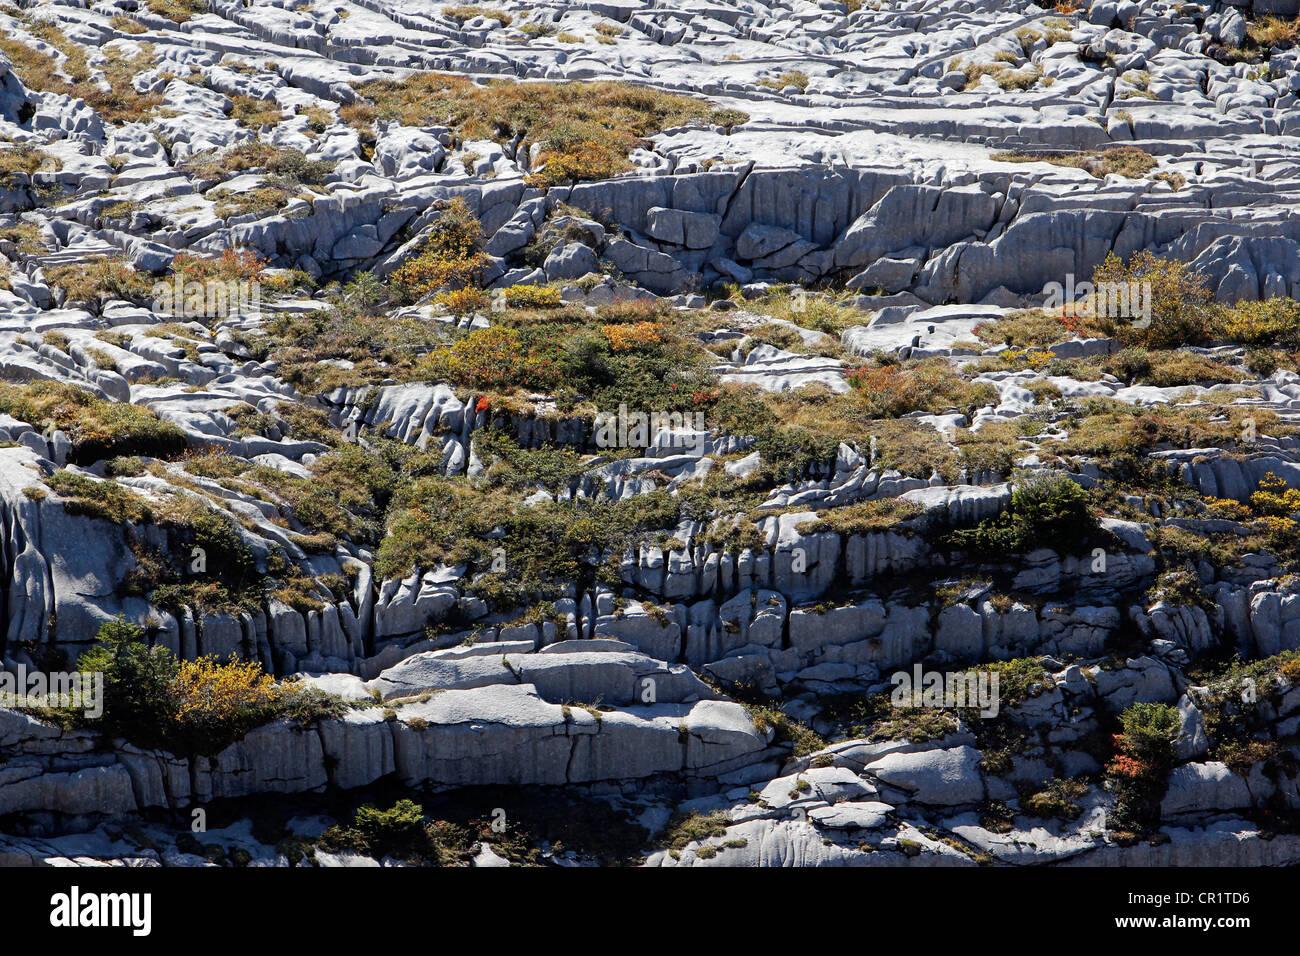 Limestone pavements, karst landforms, geology on Gamser Rugg Mountain, Toggenburg, Canton of St. Gallen, Switzerland, - Stock Image